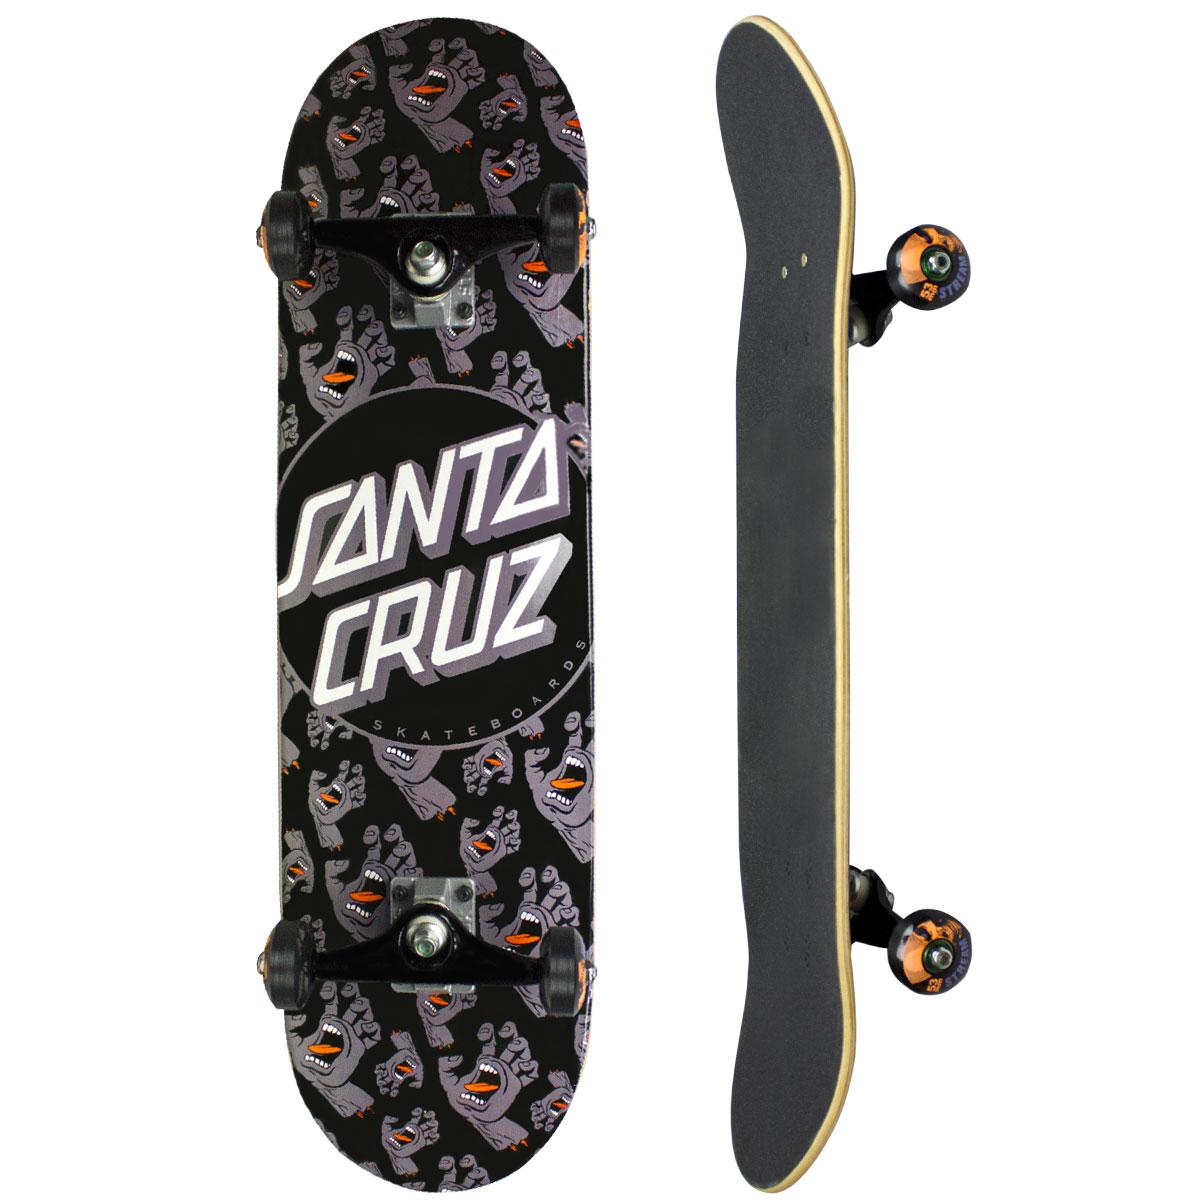 Skate Santa Cruz Completo Screaming Hand